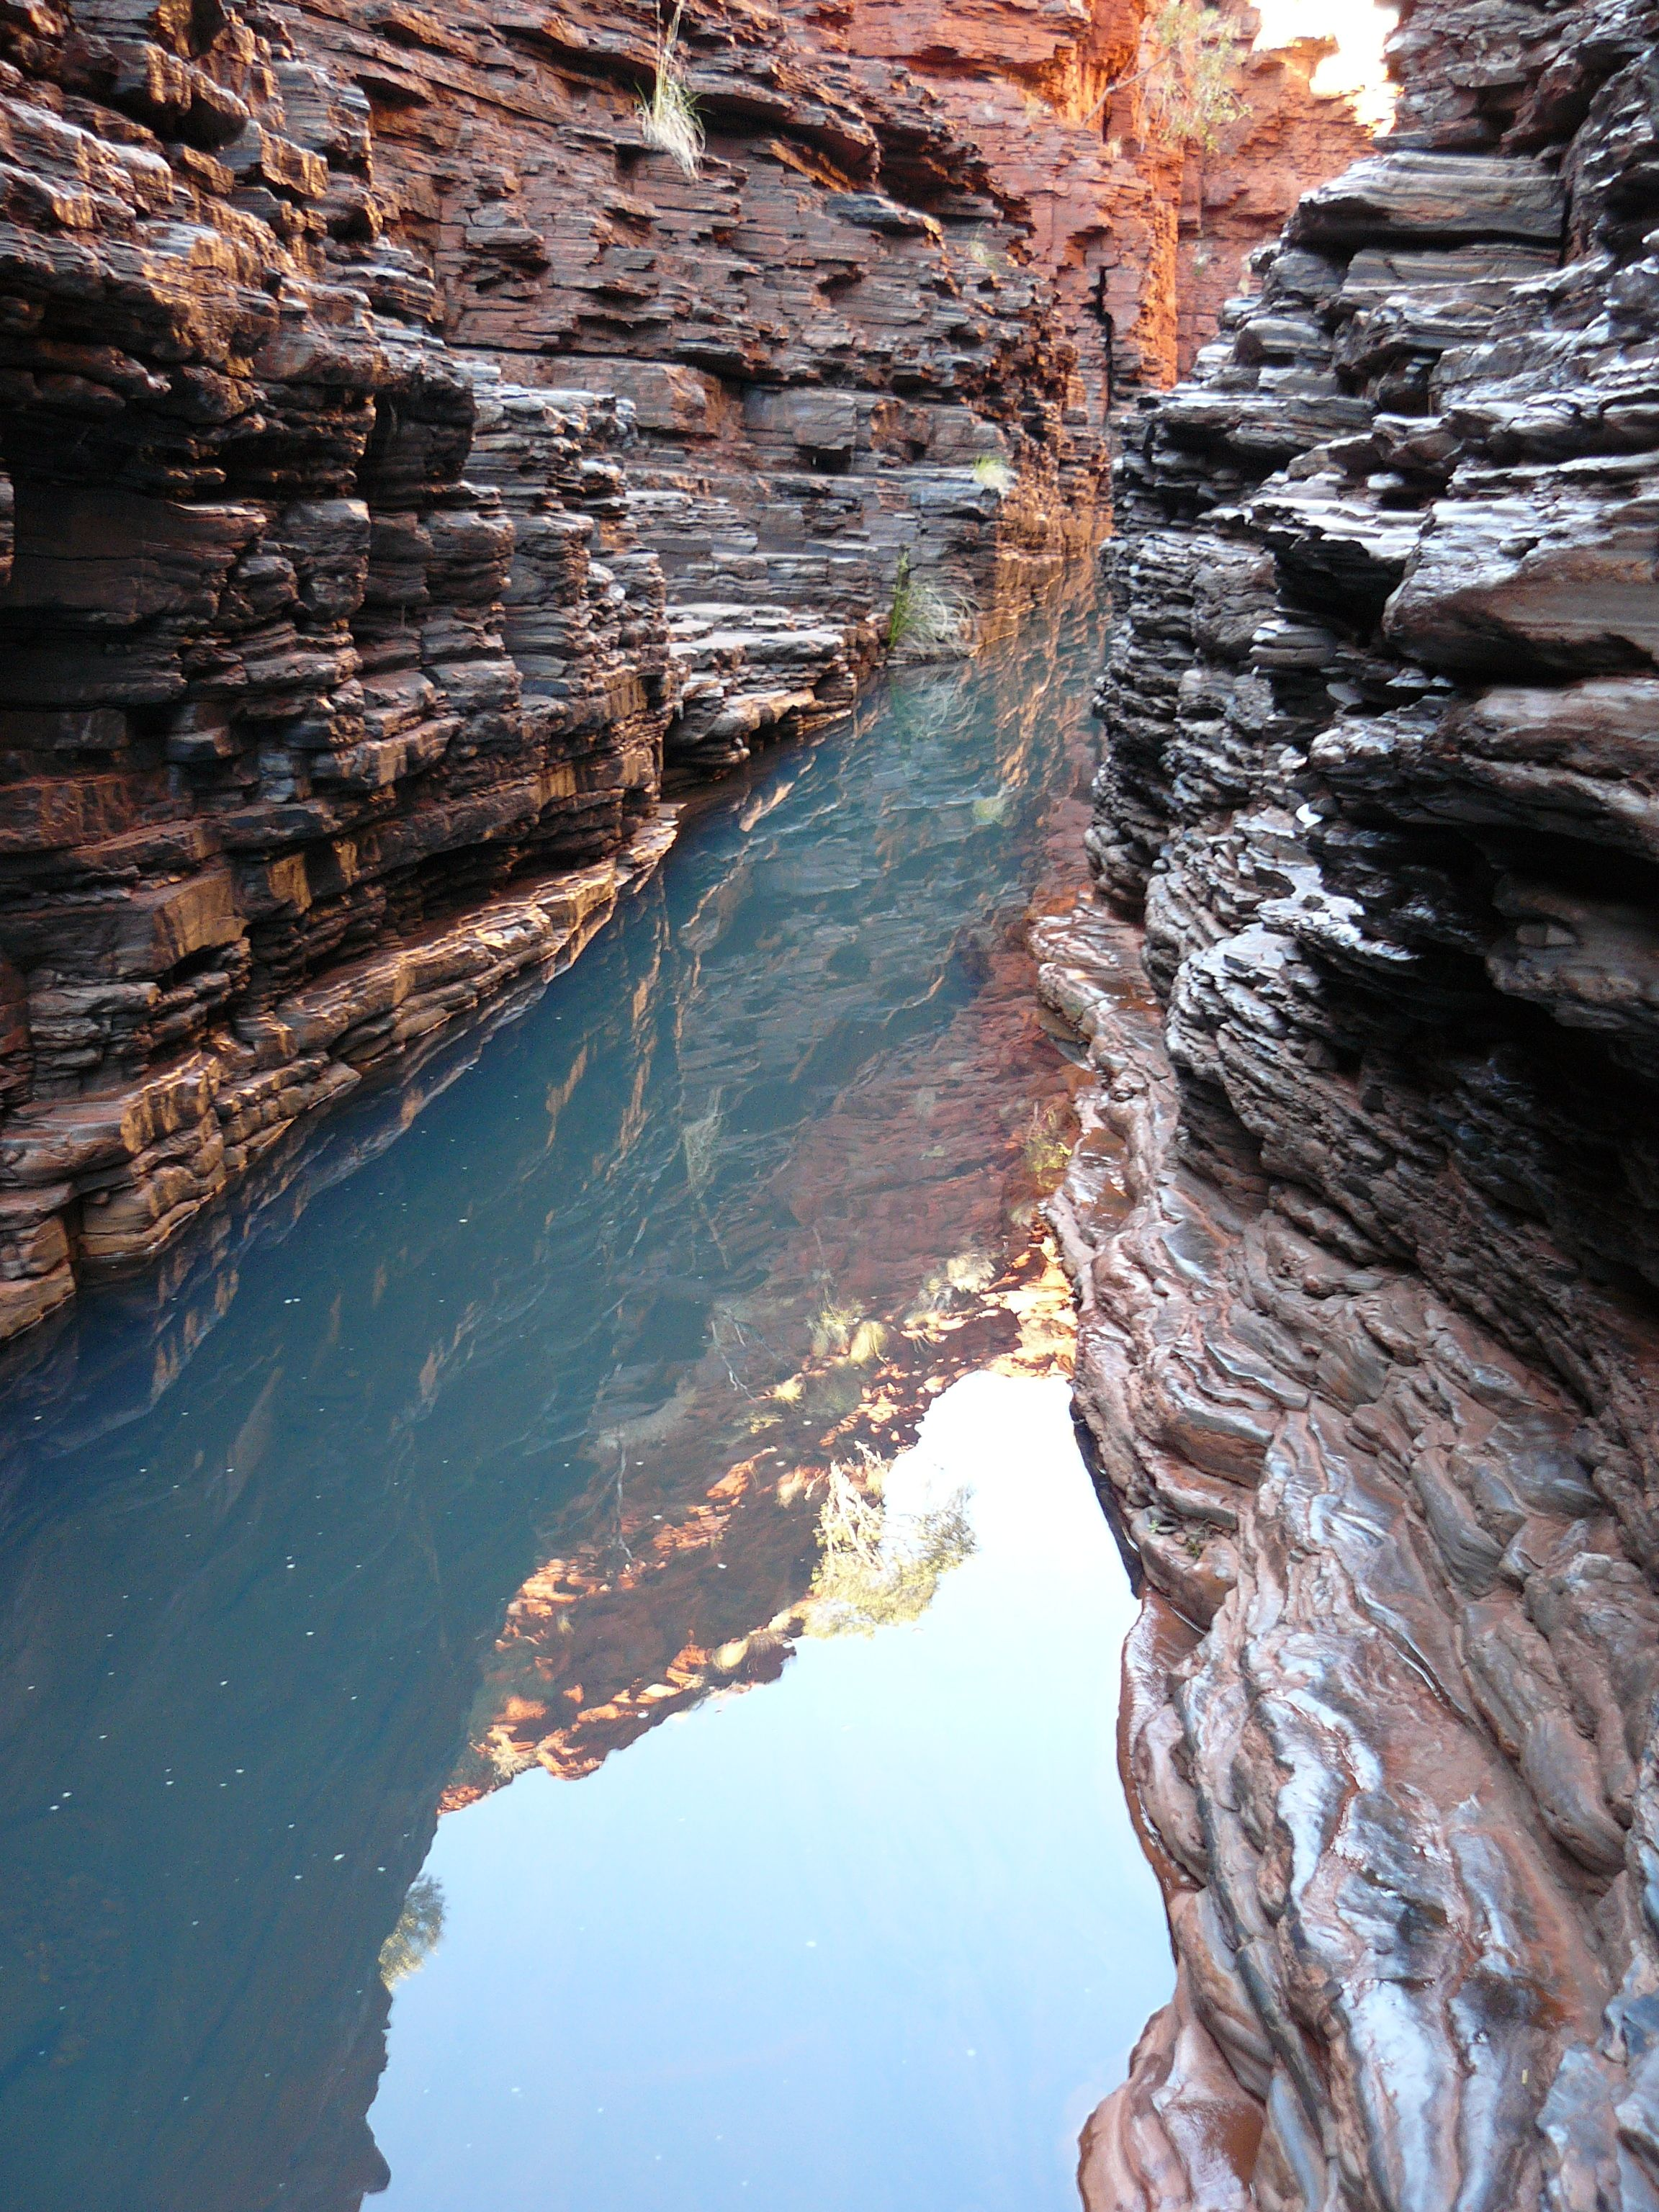 Kalbarri National Park, Western Australia, Australia